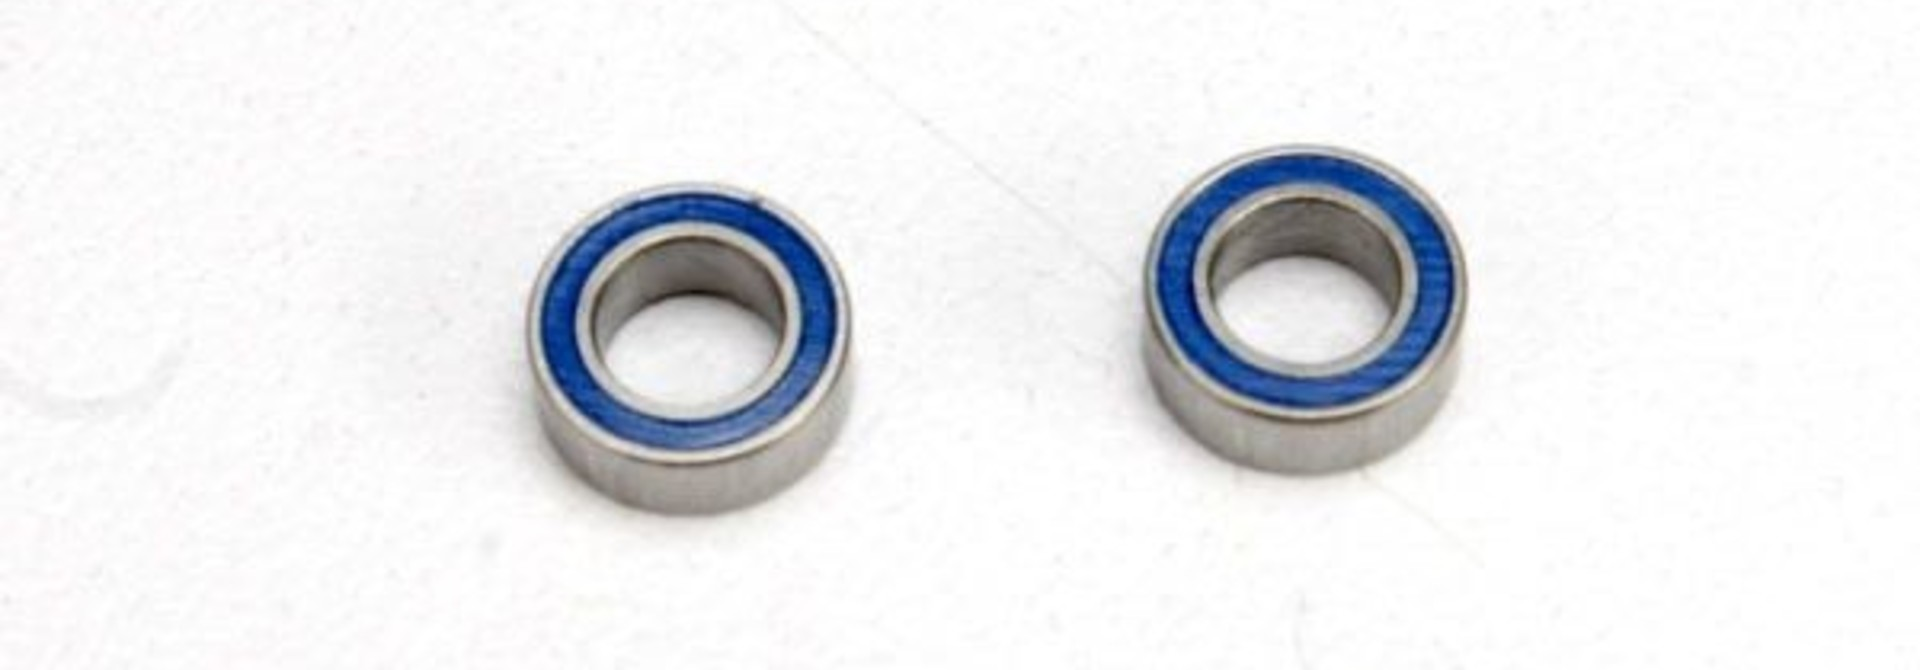 Ball bearings, blue rubber sealed (4x7x2.5mm) (2), TRX5124